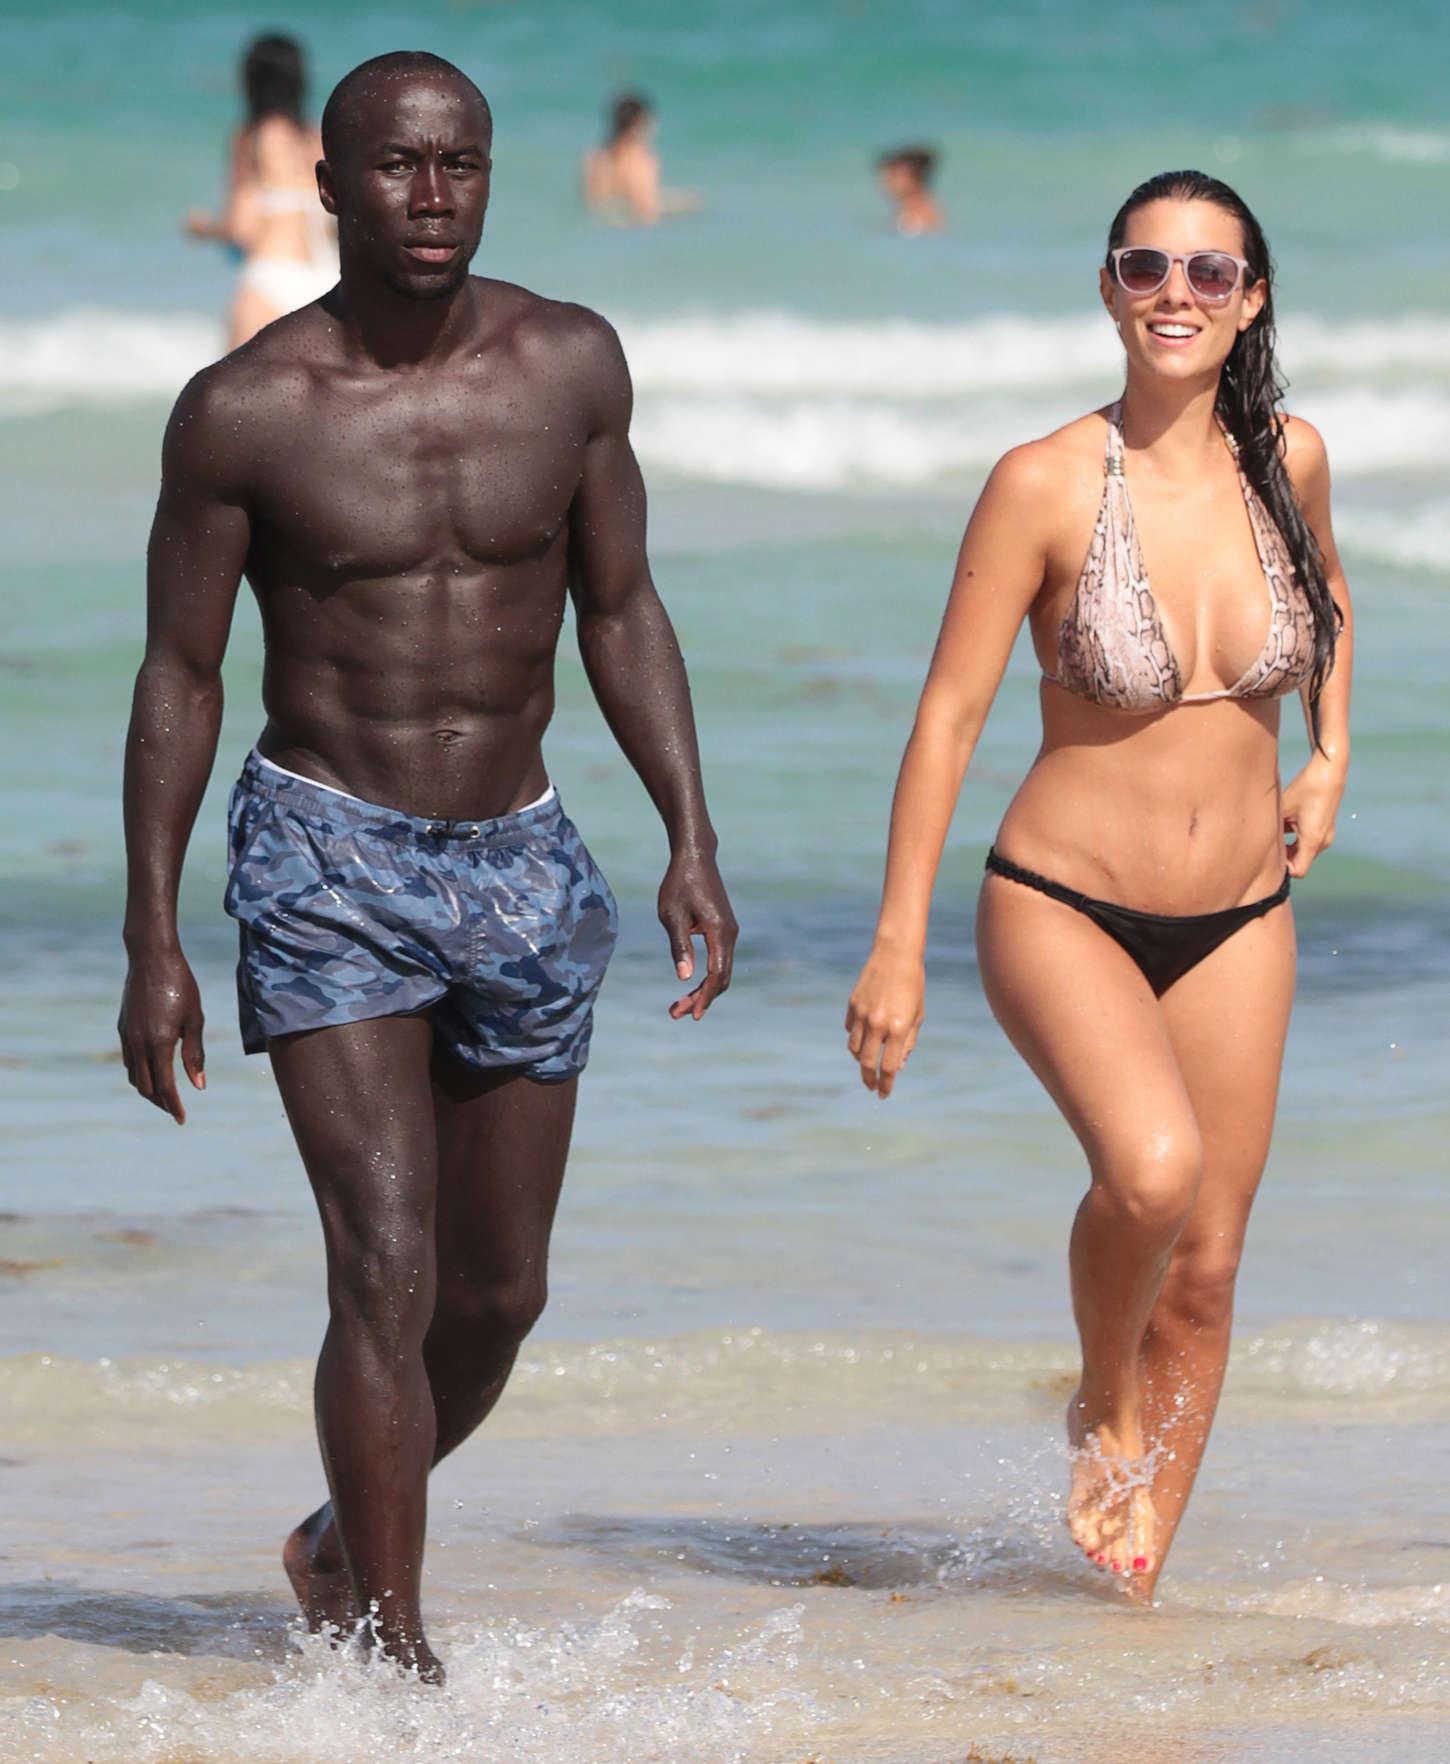 Paparazzi Ludivine Sagna nudes (23 photos), Tits, Is a cute, Feet, cleavage 2020